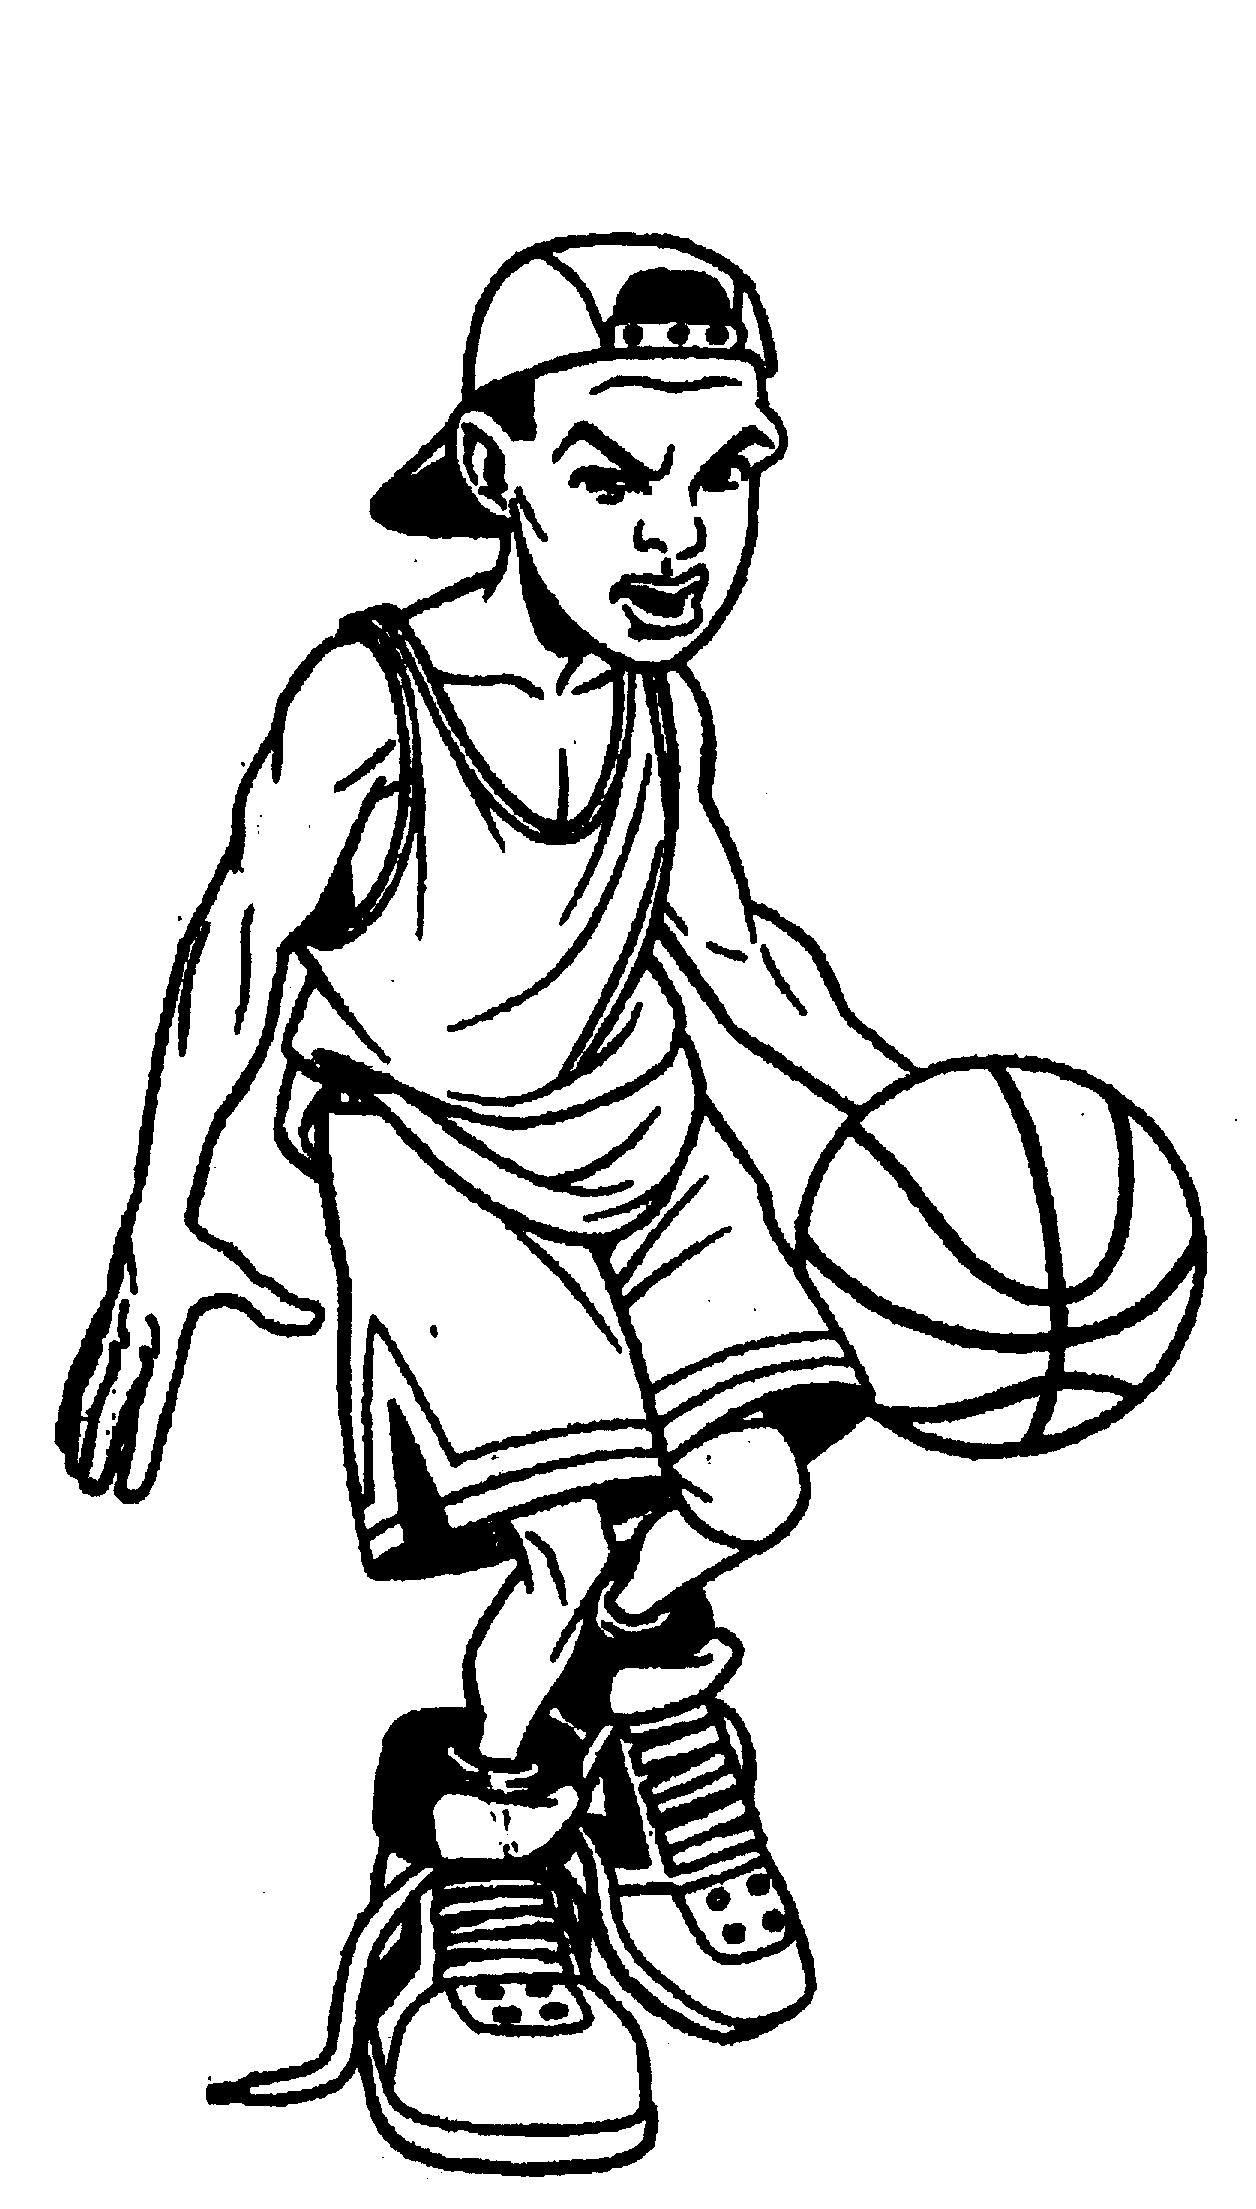 1256x2209 Cool Basketball Drawings Drawings Of Basketball